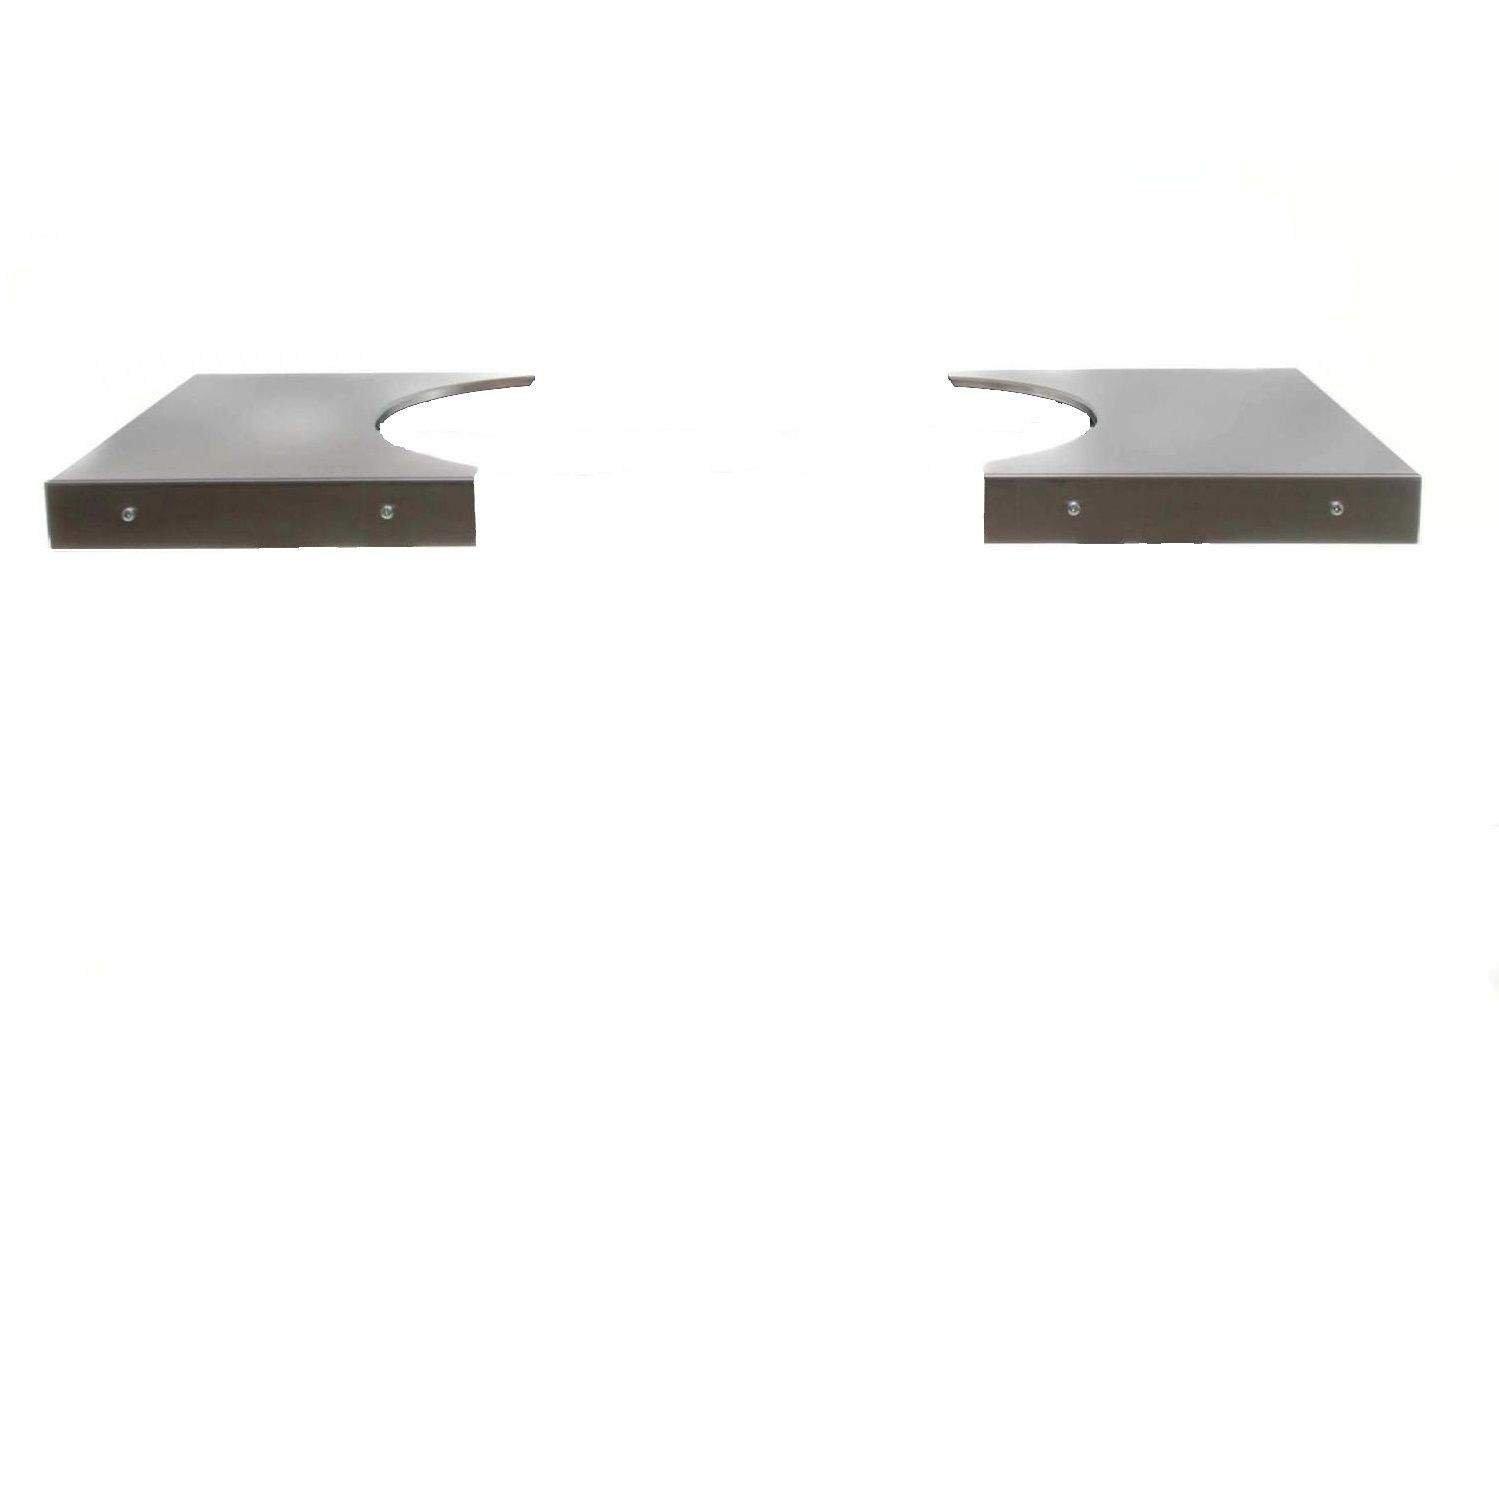 Primo 369 Grill Shelves, Silver